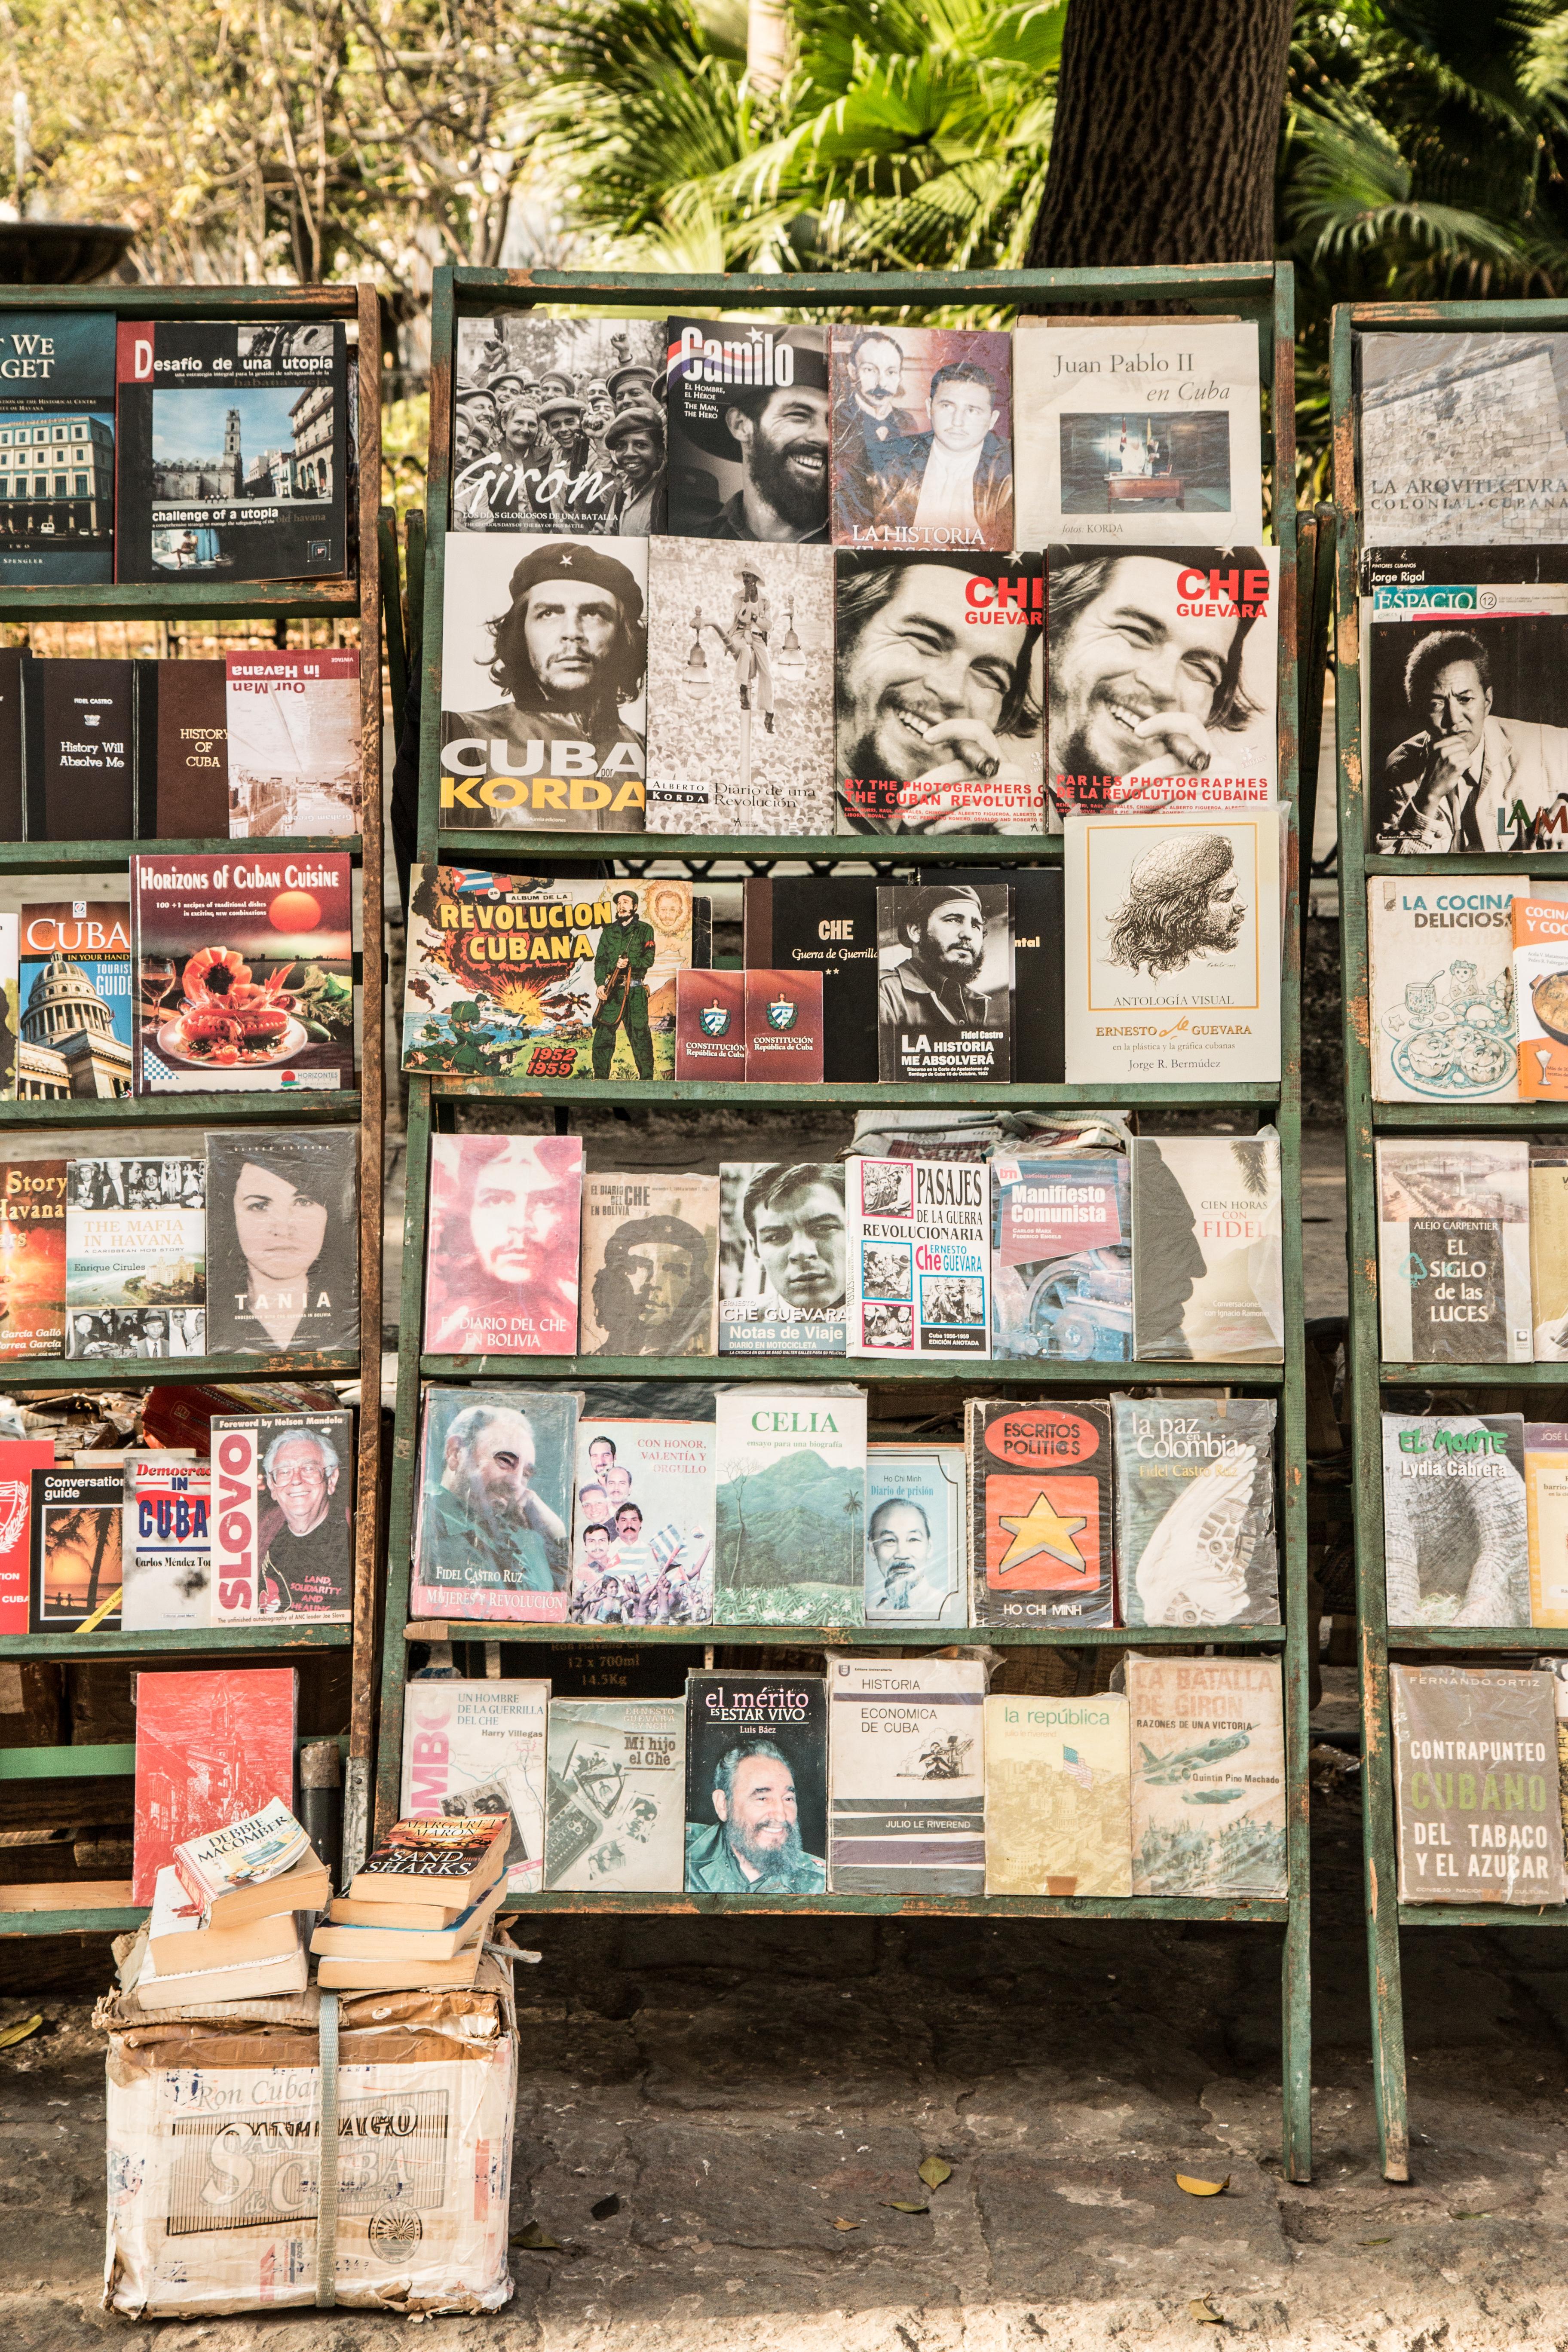 Literatur über Che Guevara